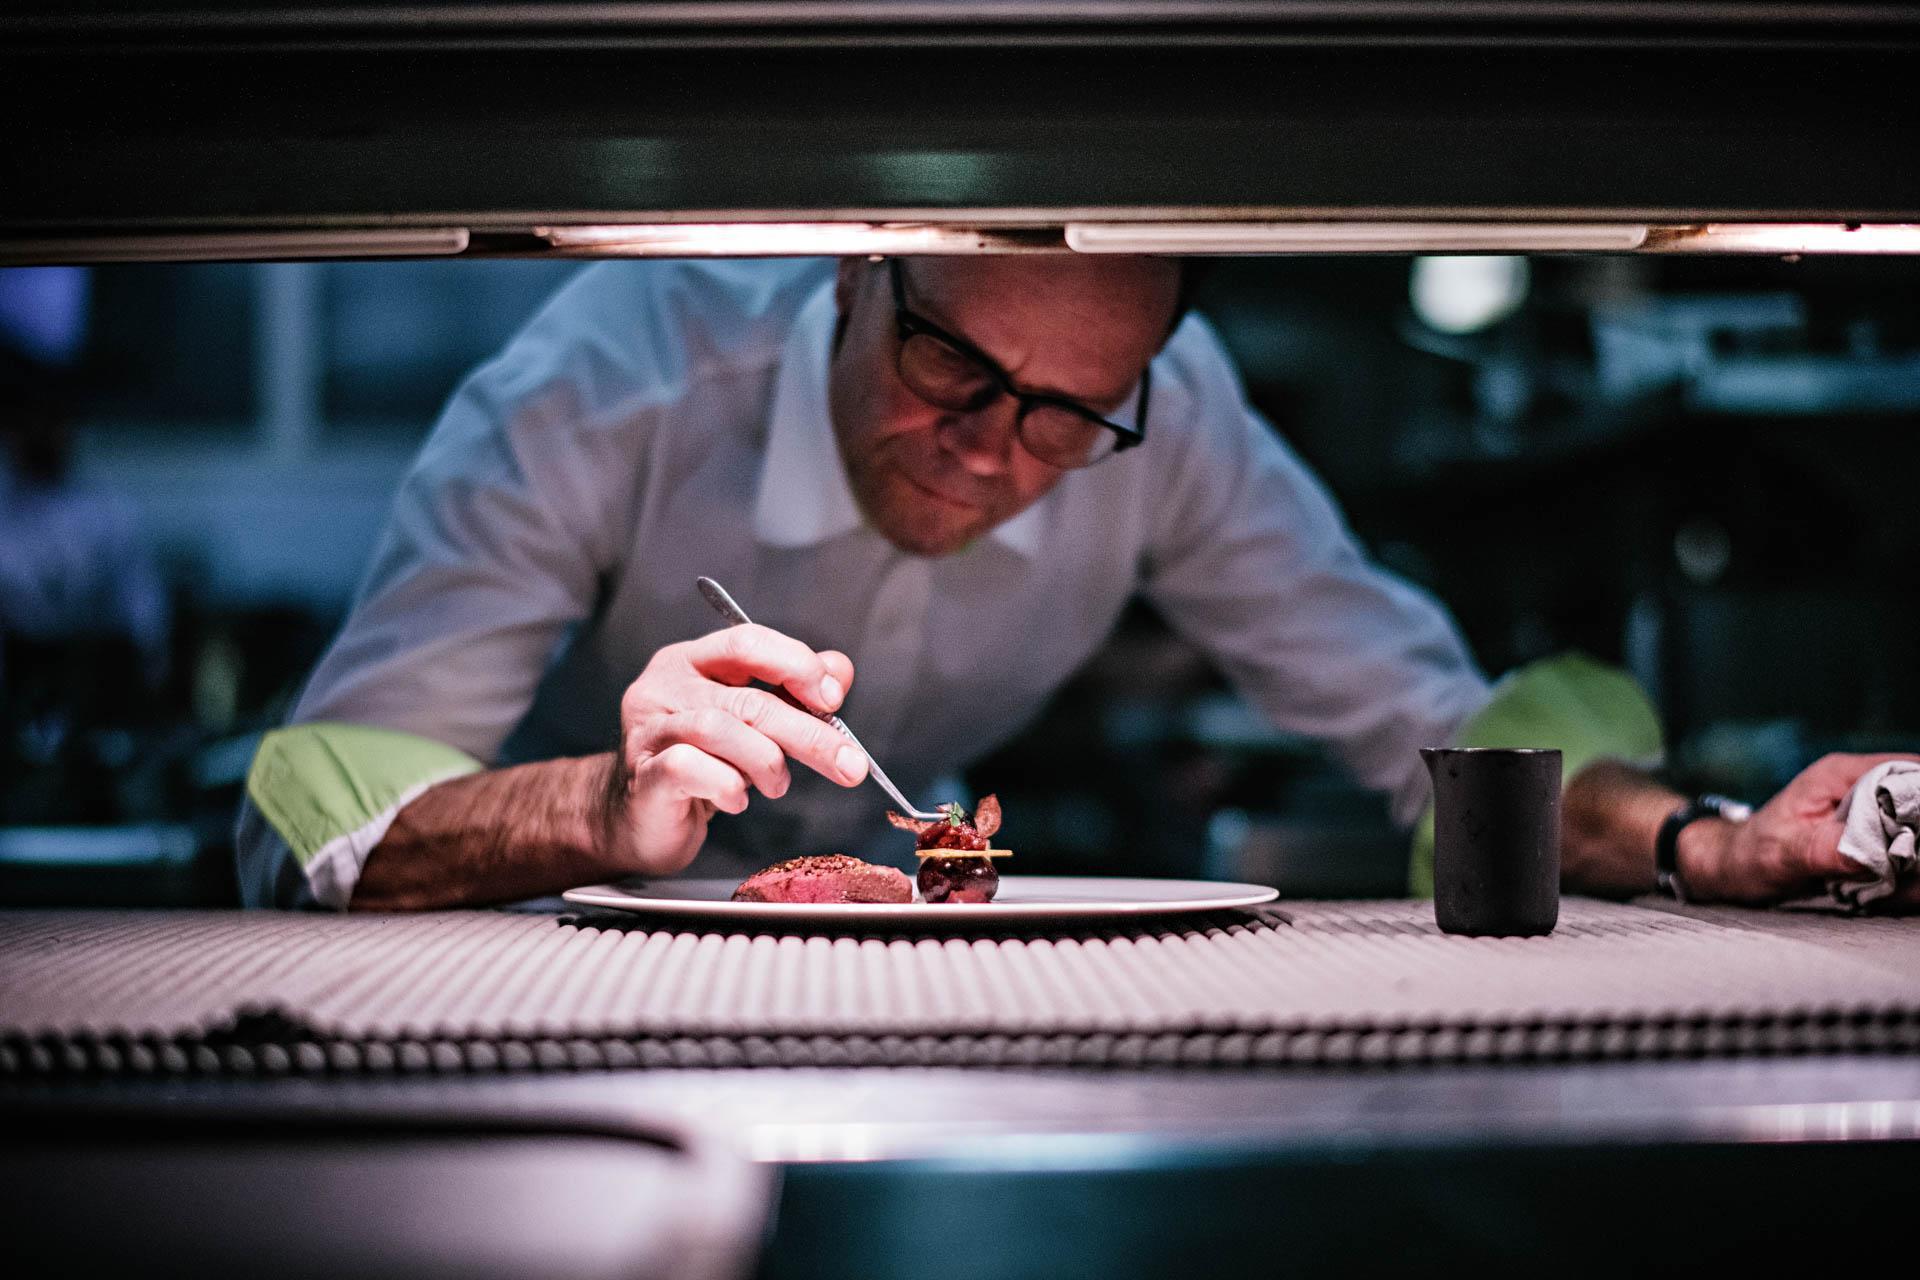 En cuisine avec Bernard Loiseau © Franck Juery